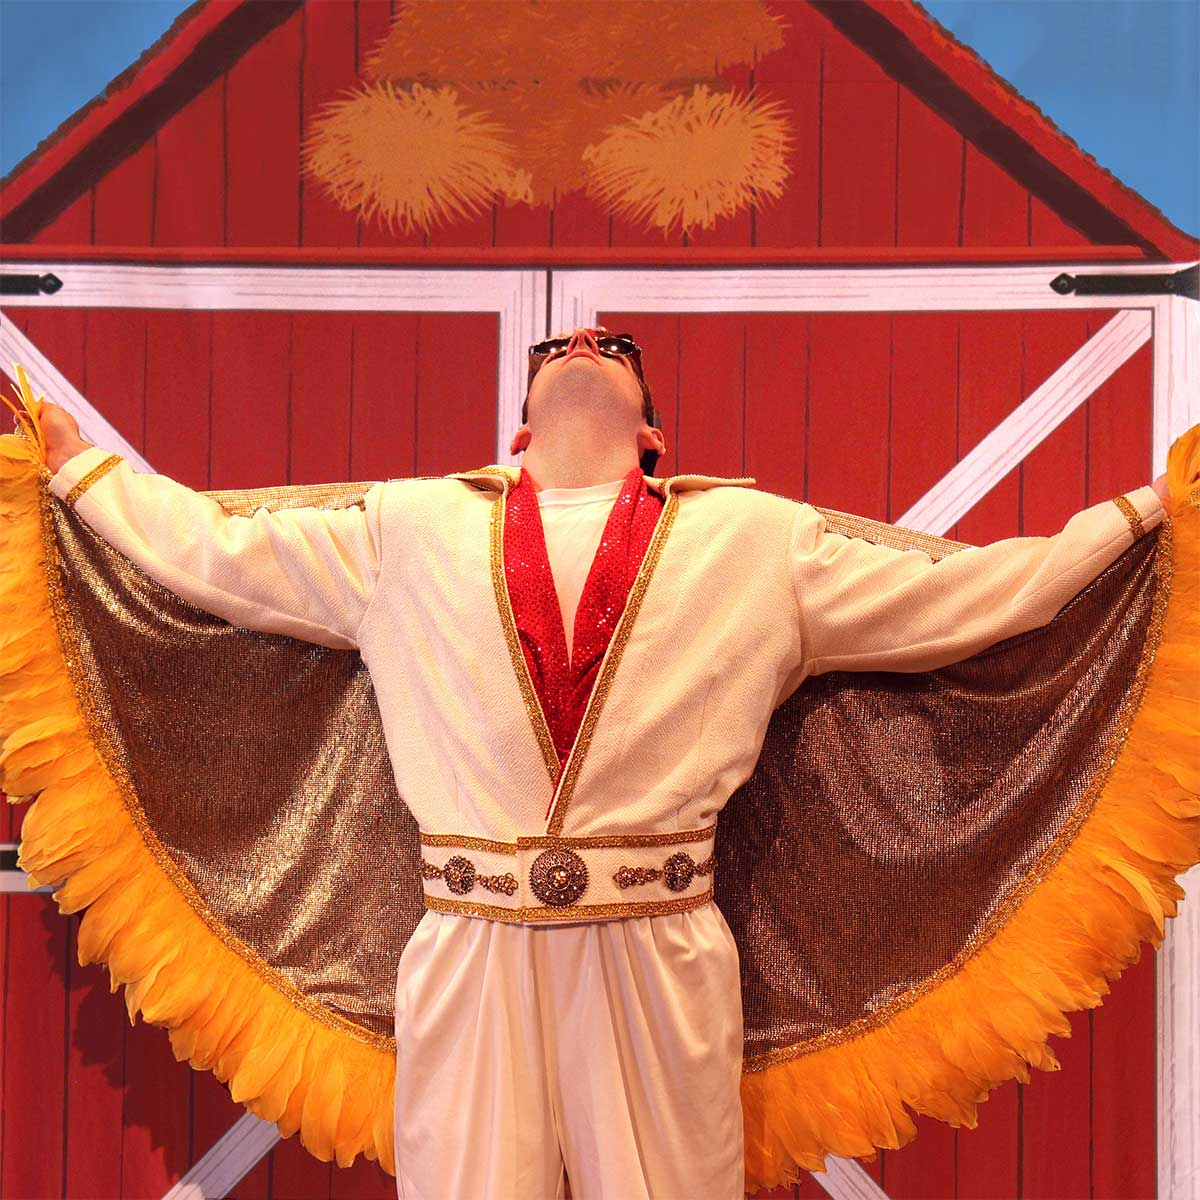 Elvis open cape in front of barn